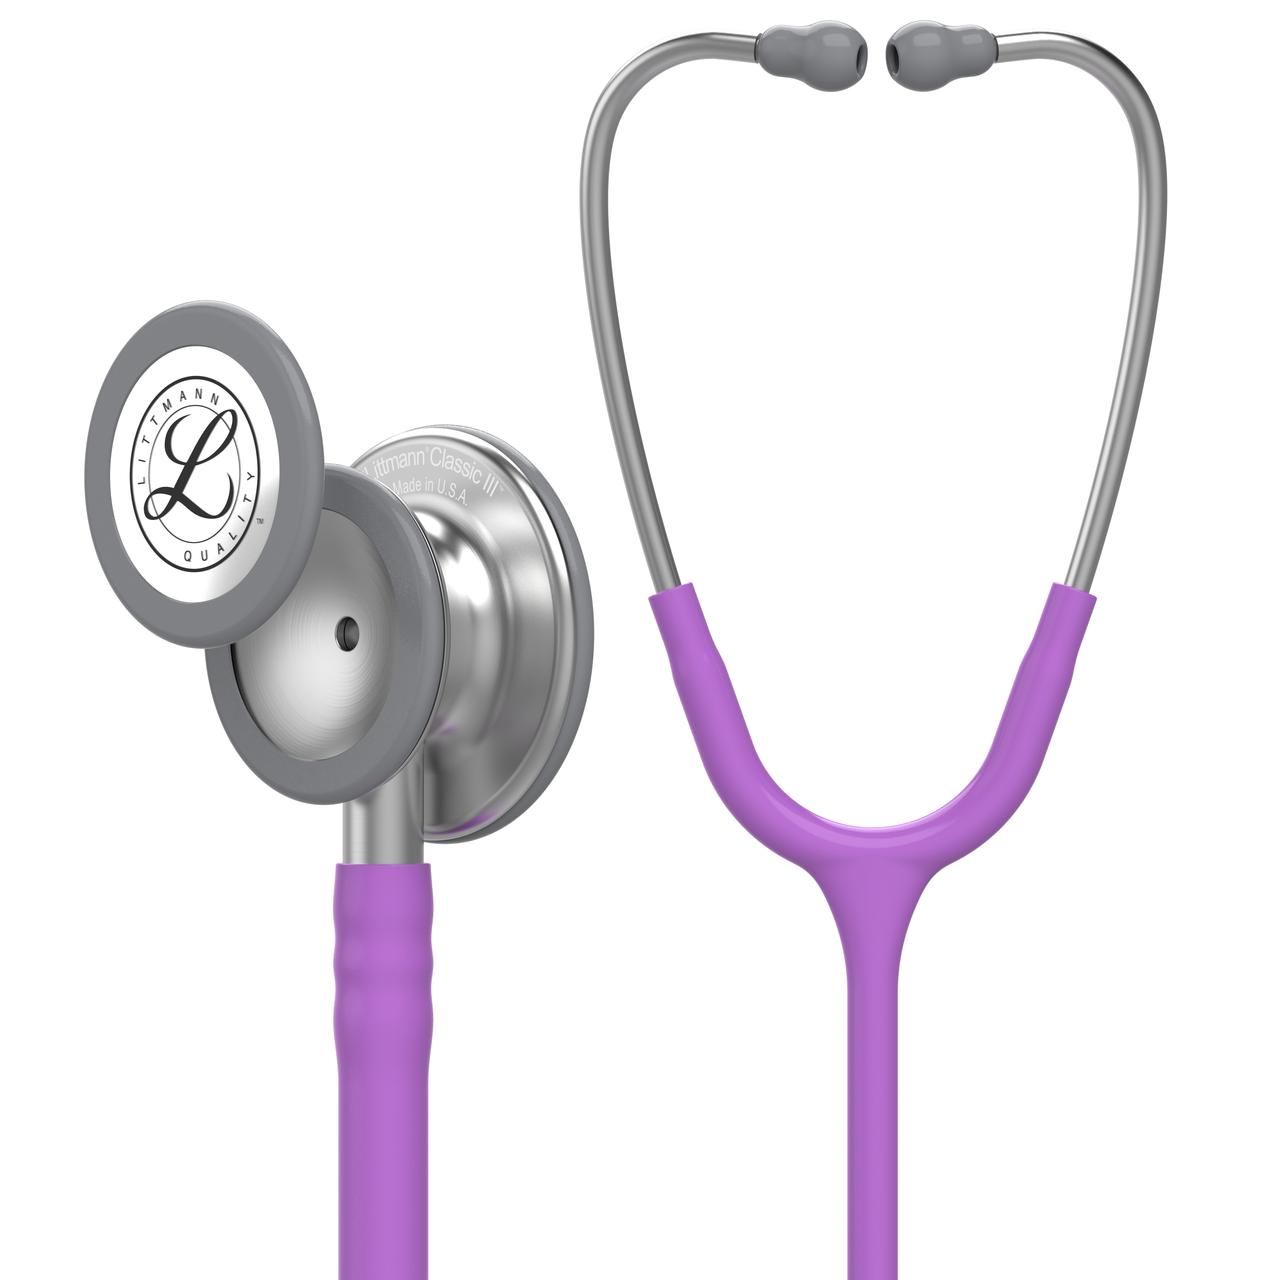 Littmann Classic III Stethoscope, Lavender, 5832